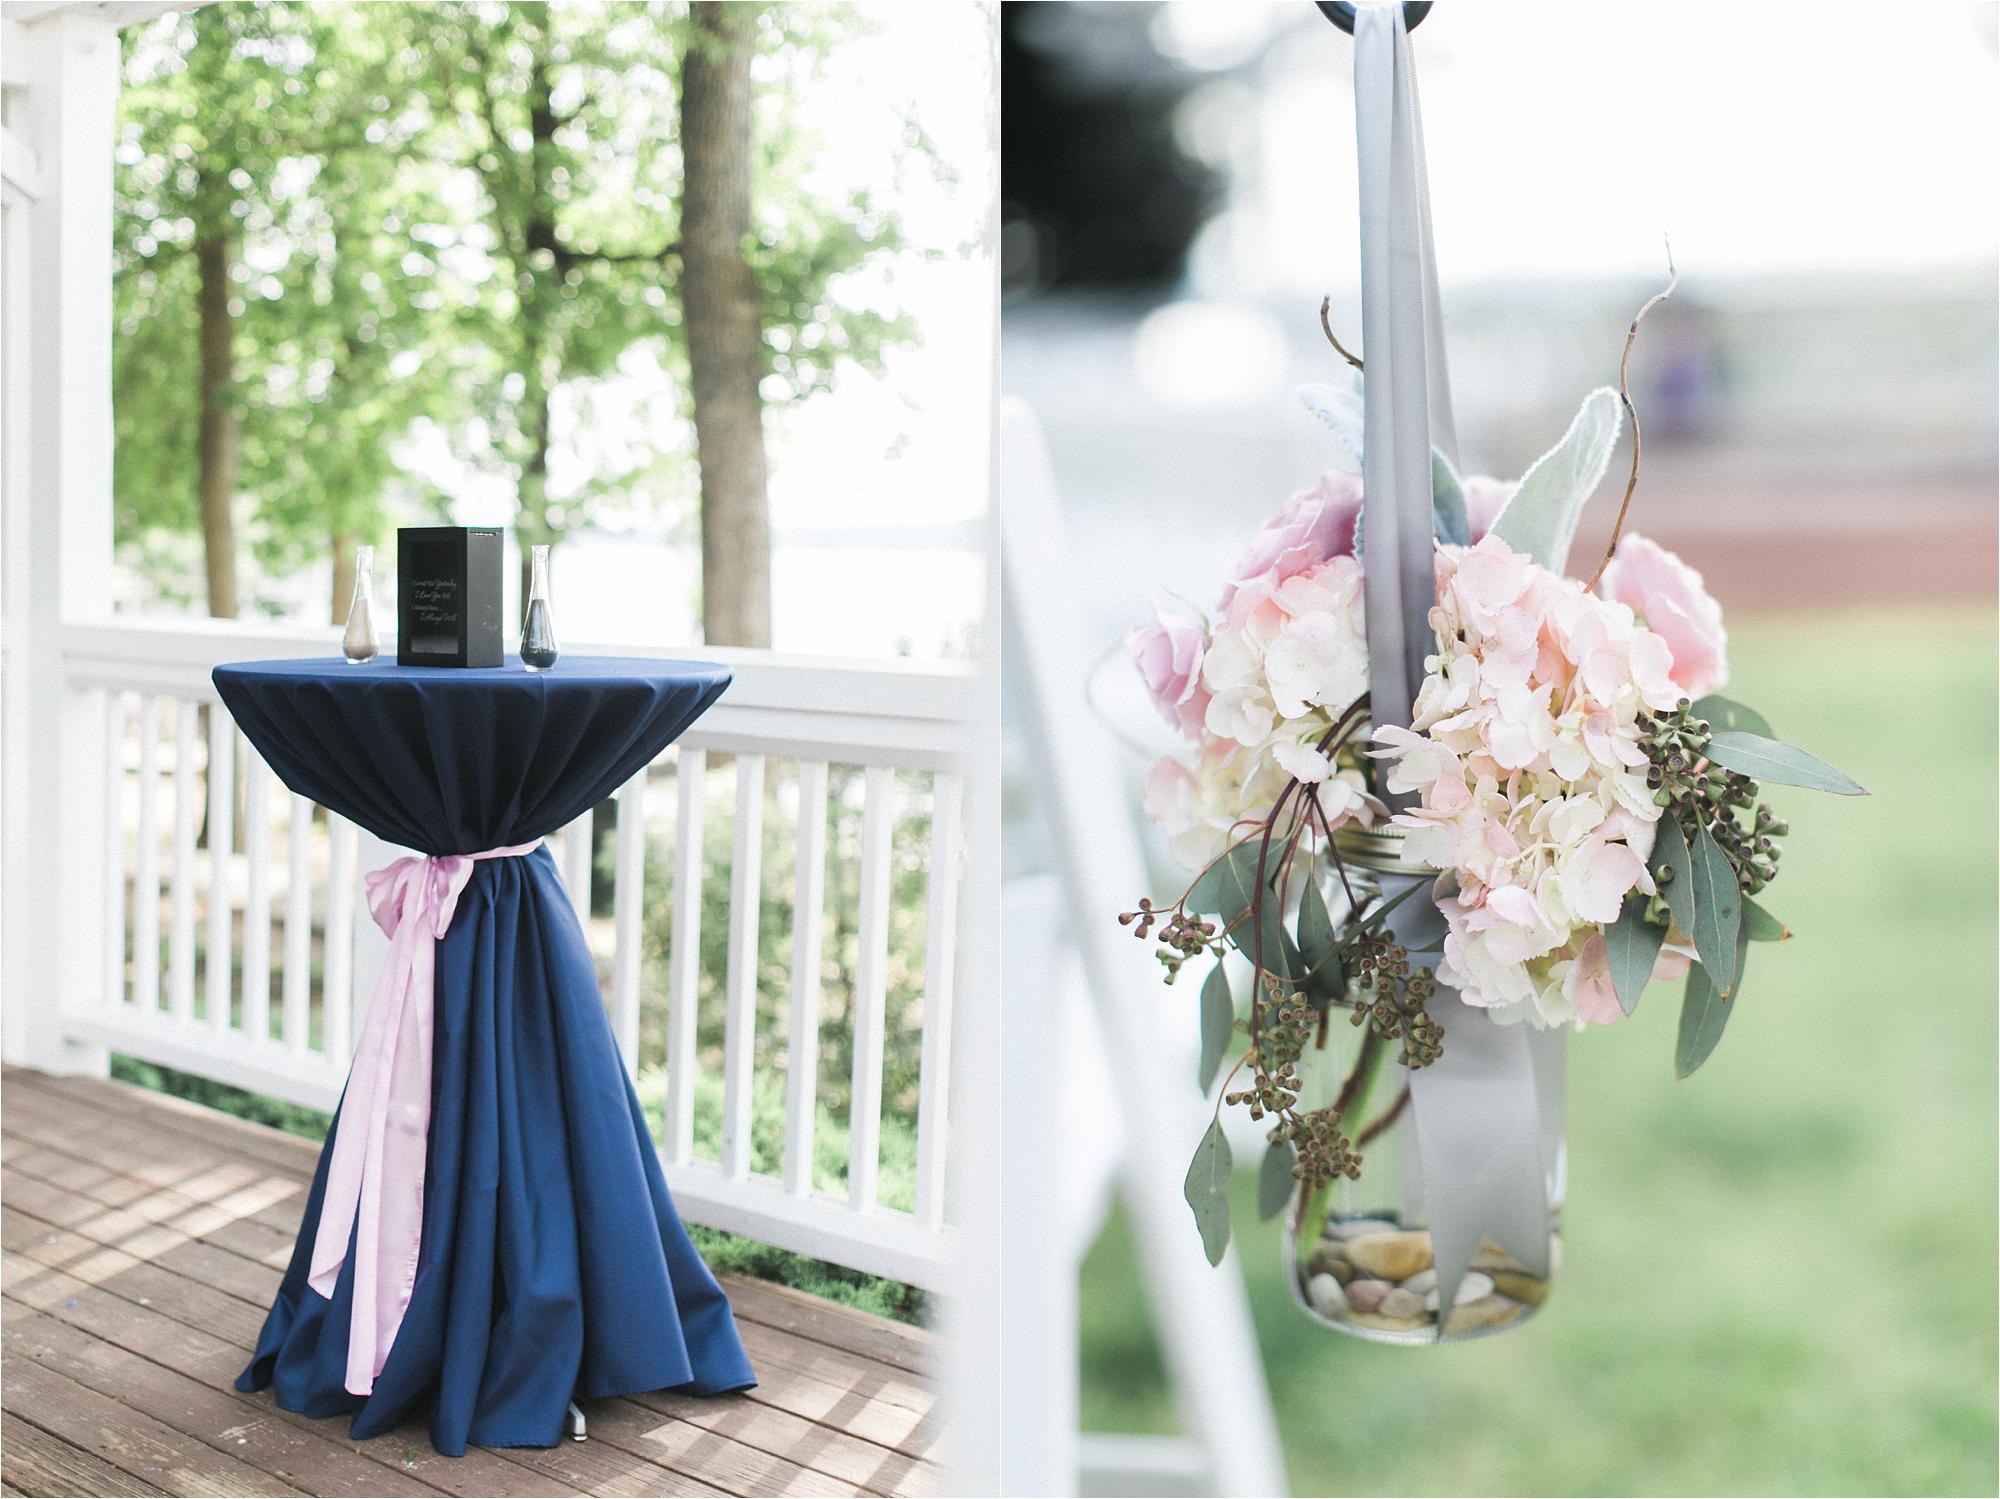 stephanie-yonce-boathouse-sunday-park-virginia-wedding-photo-013.JPG